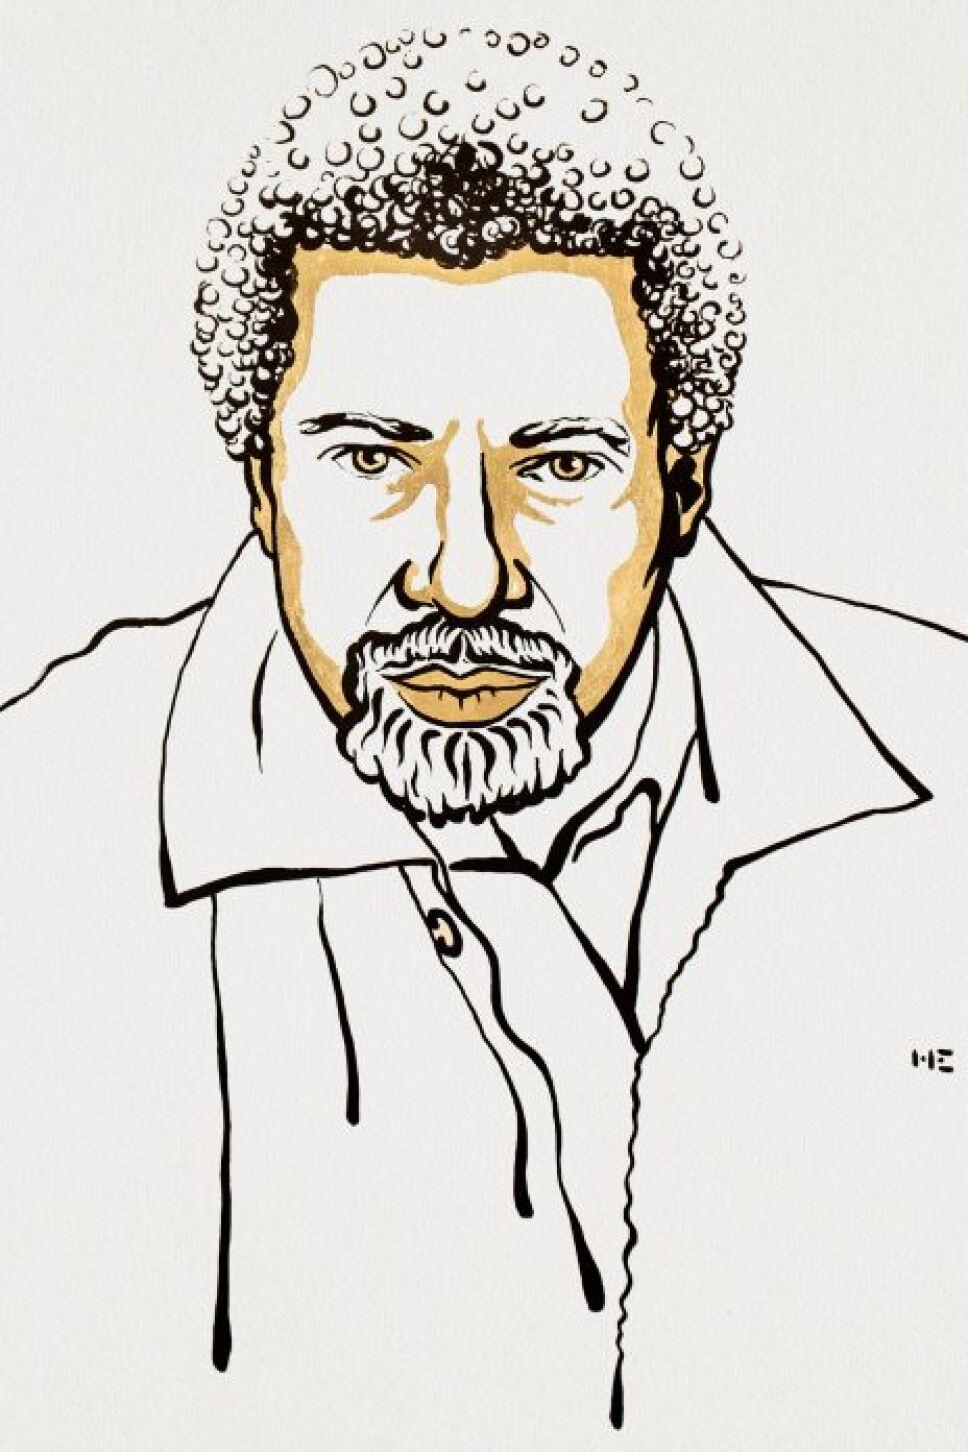 abdularazak gurnah ganador premio nobel literatura 2021 obras